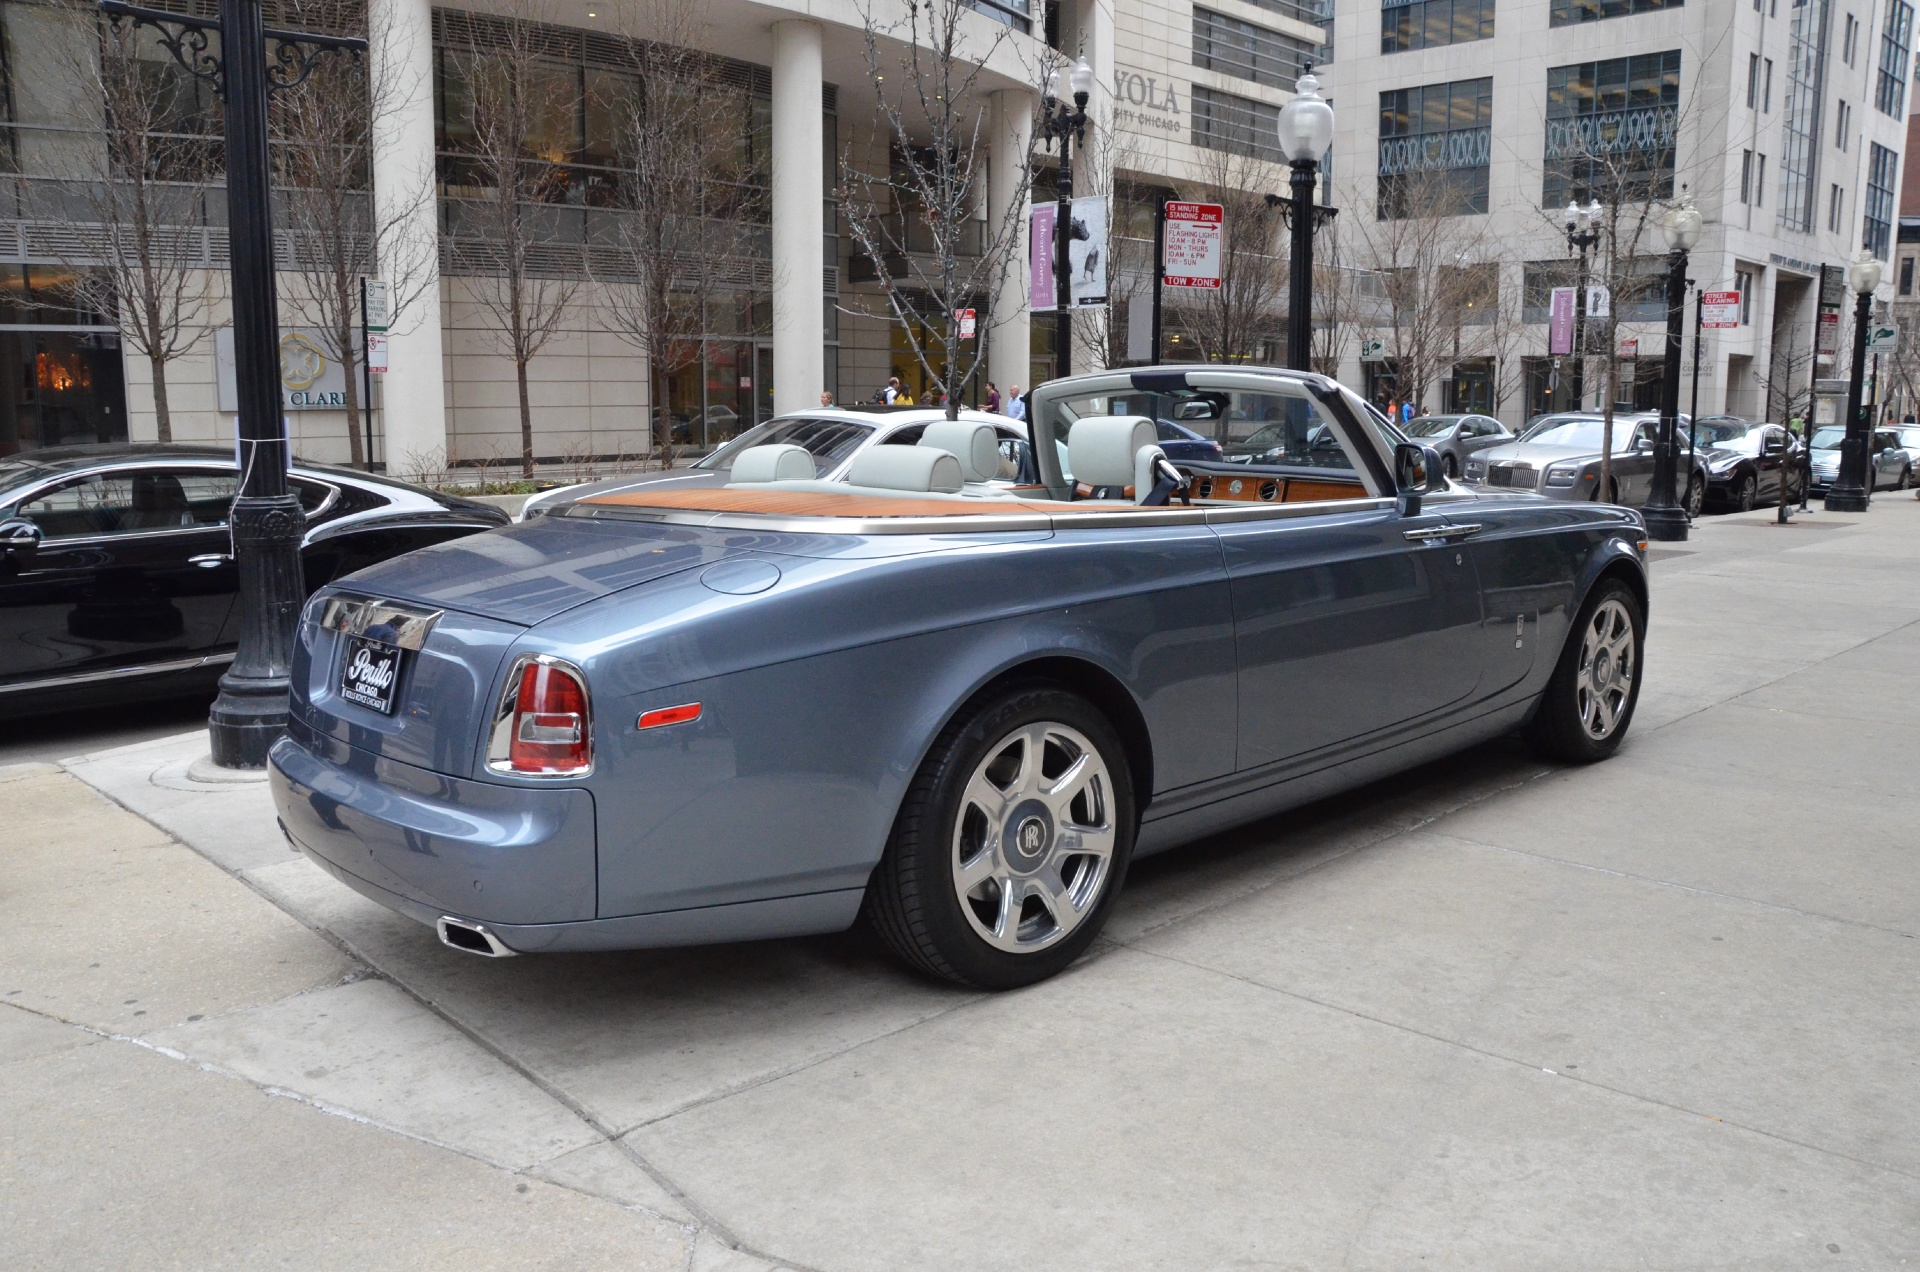 2010 rolls royce phantom drophead coupe stock r129aa for - Rolls royce phantom drophead coupe for sale ...